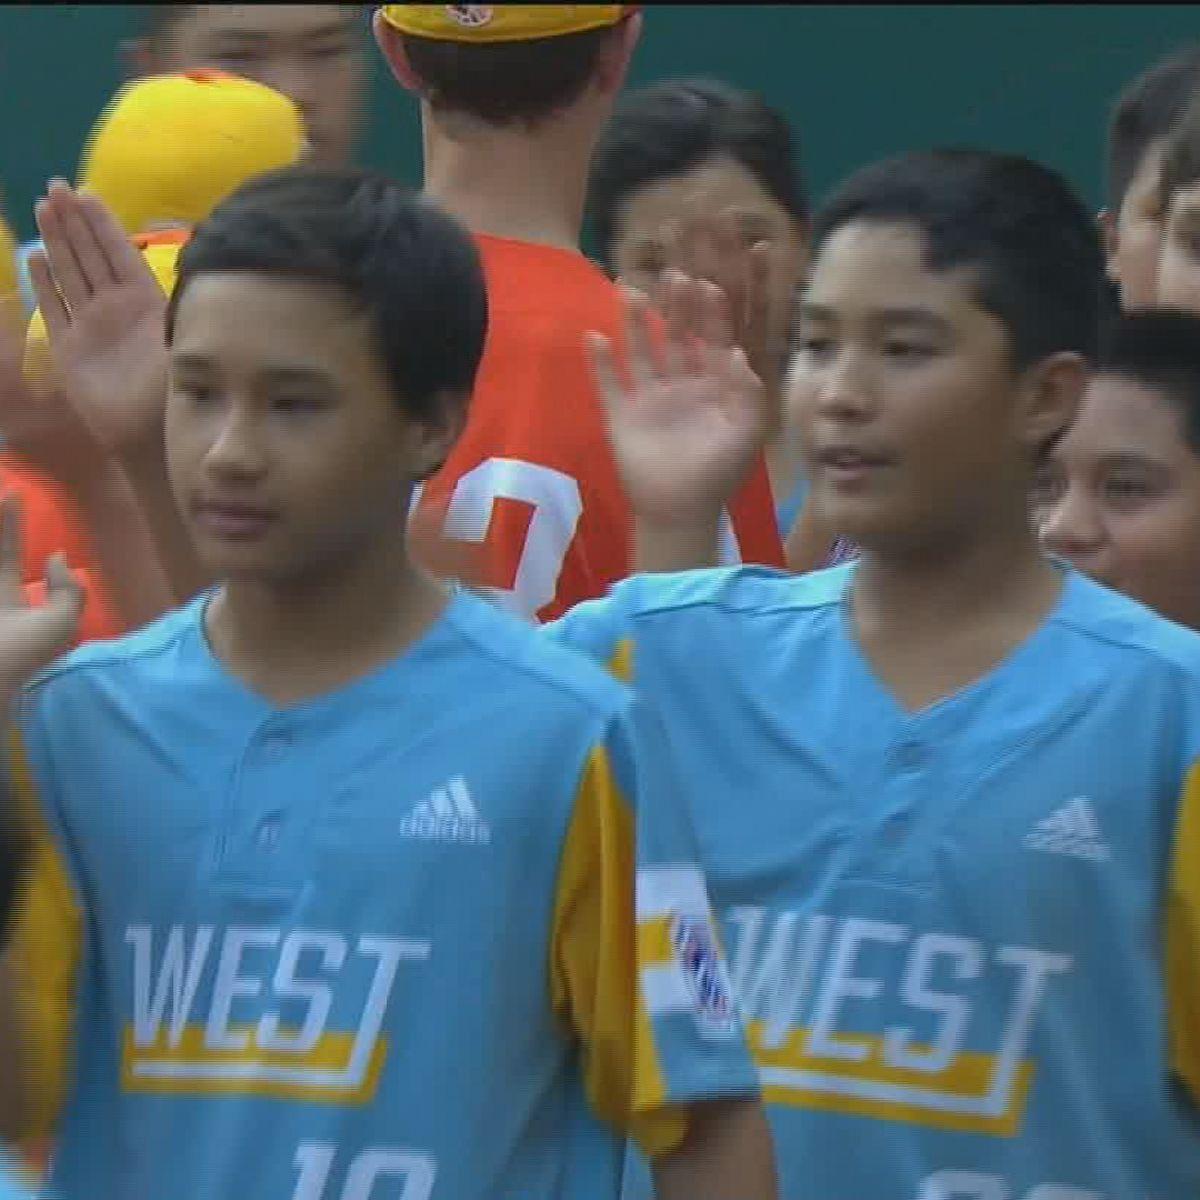 Hawaii Heartbreak: 6th inning rally falls short in LLWS U.S. Championship Game